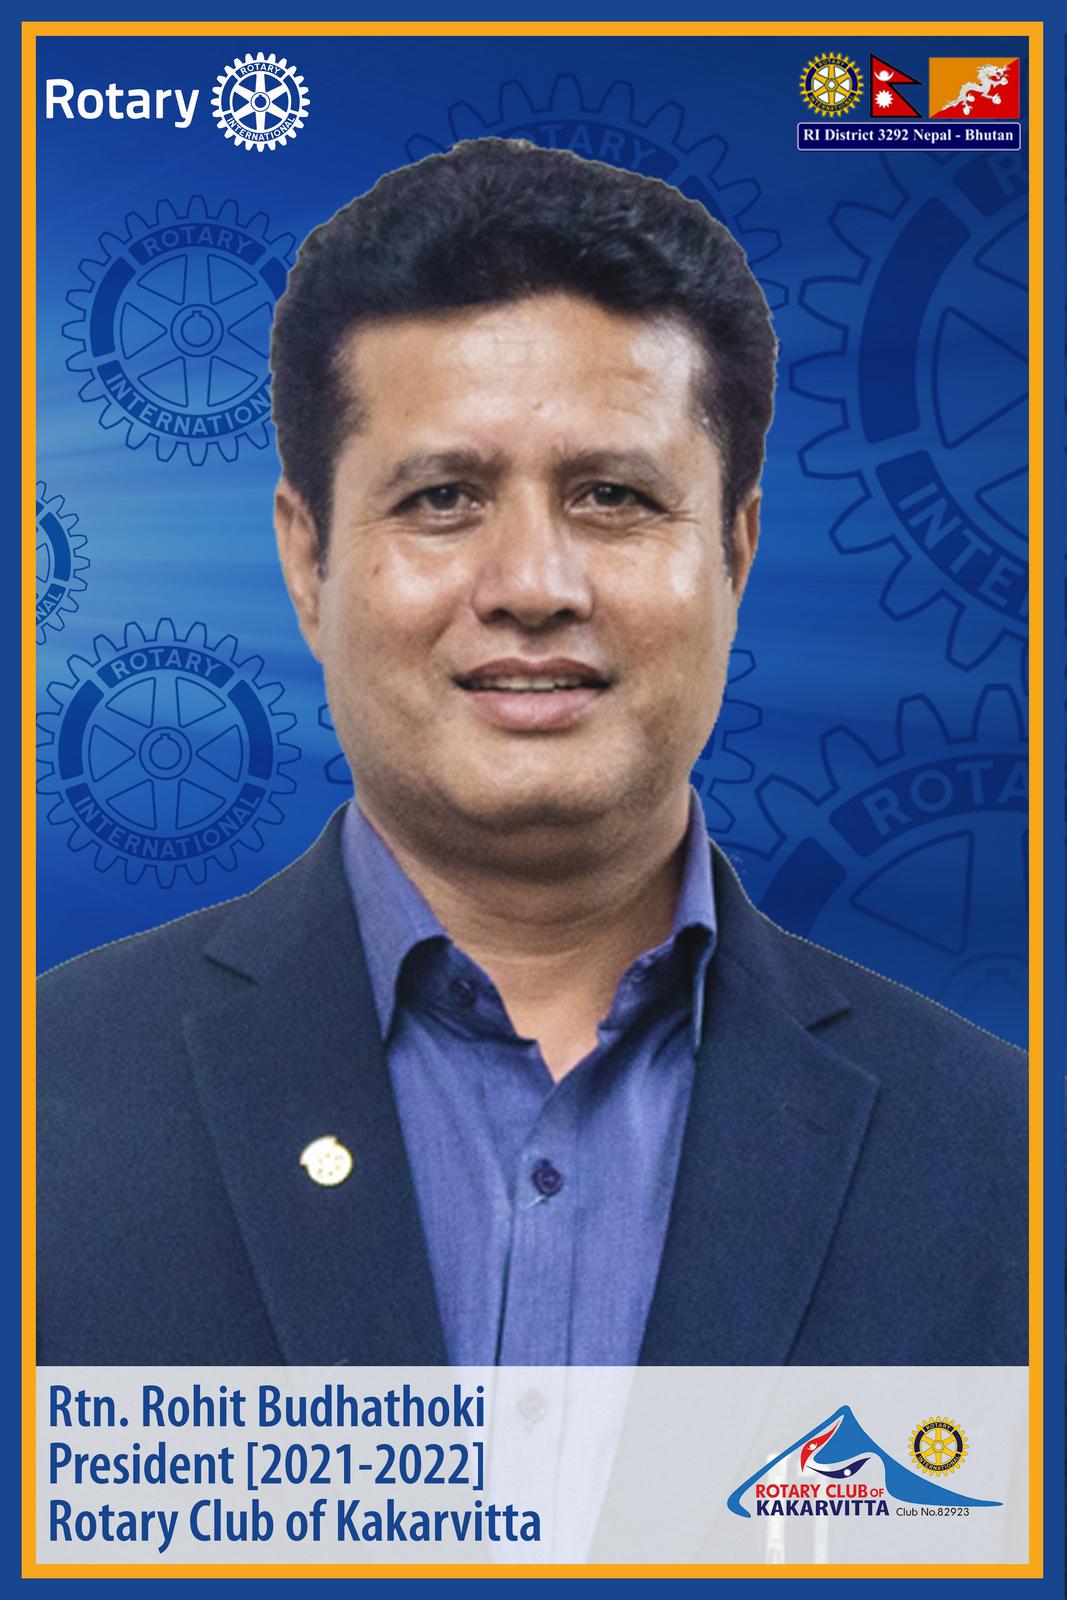 rtn. rohit budhathoki president 2021 22 rotary club of kakarvitta